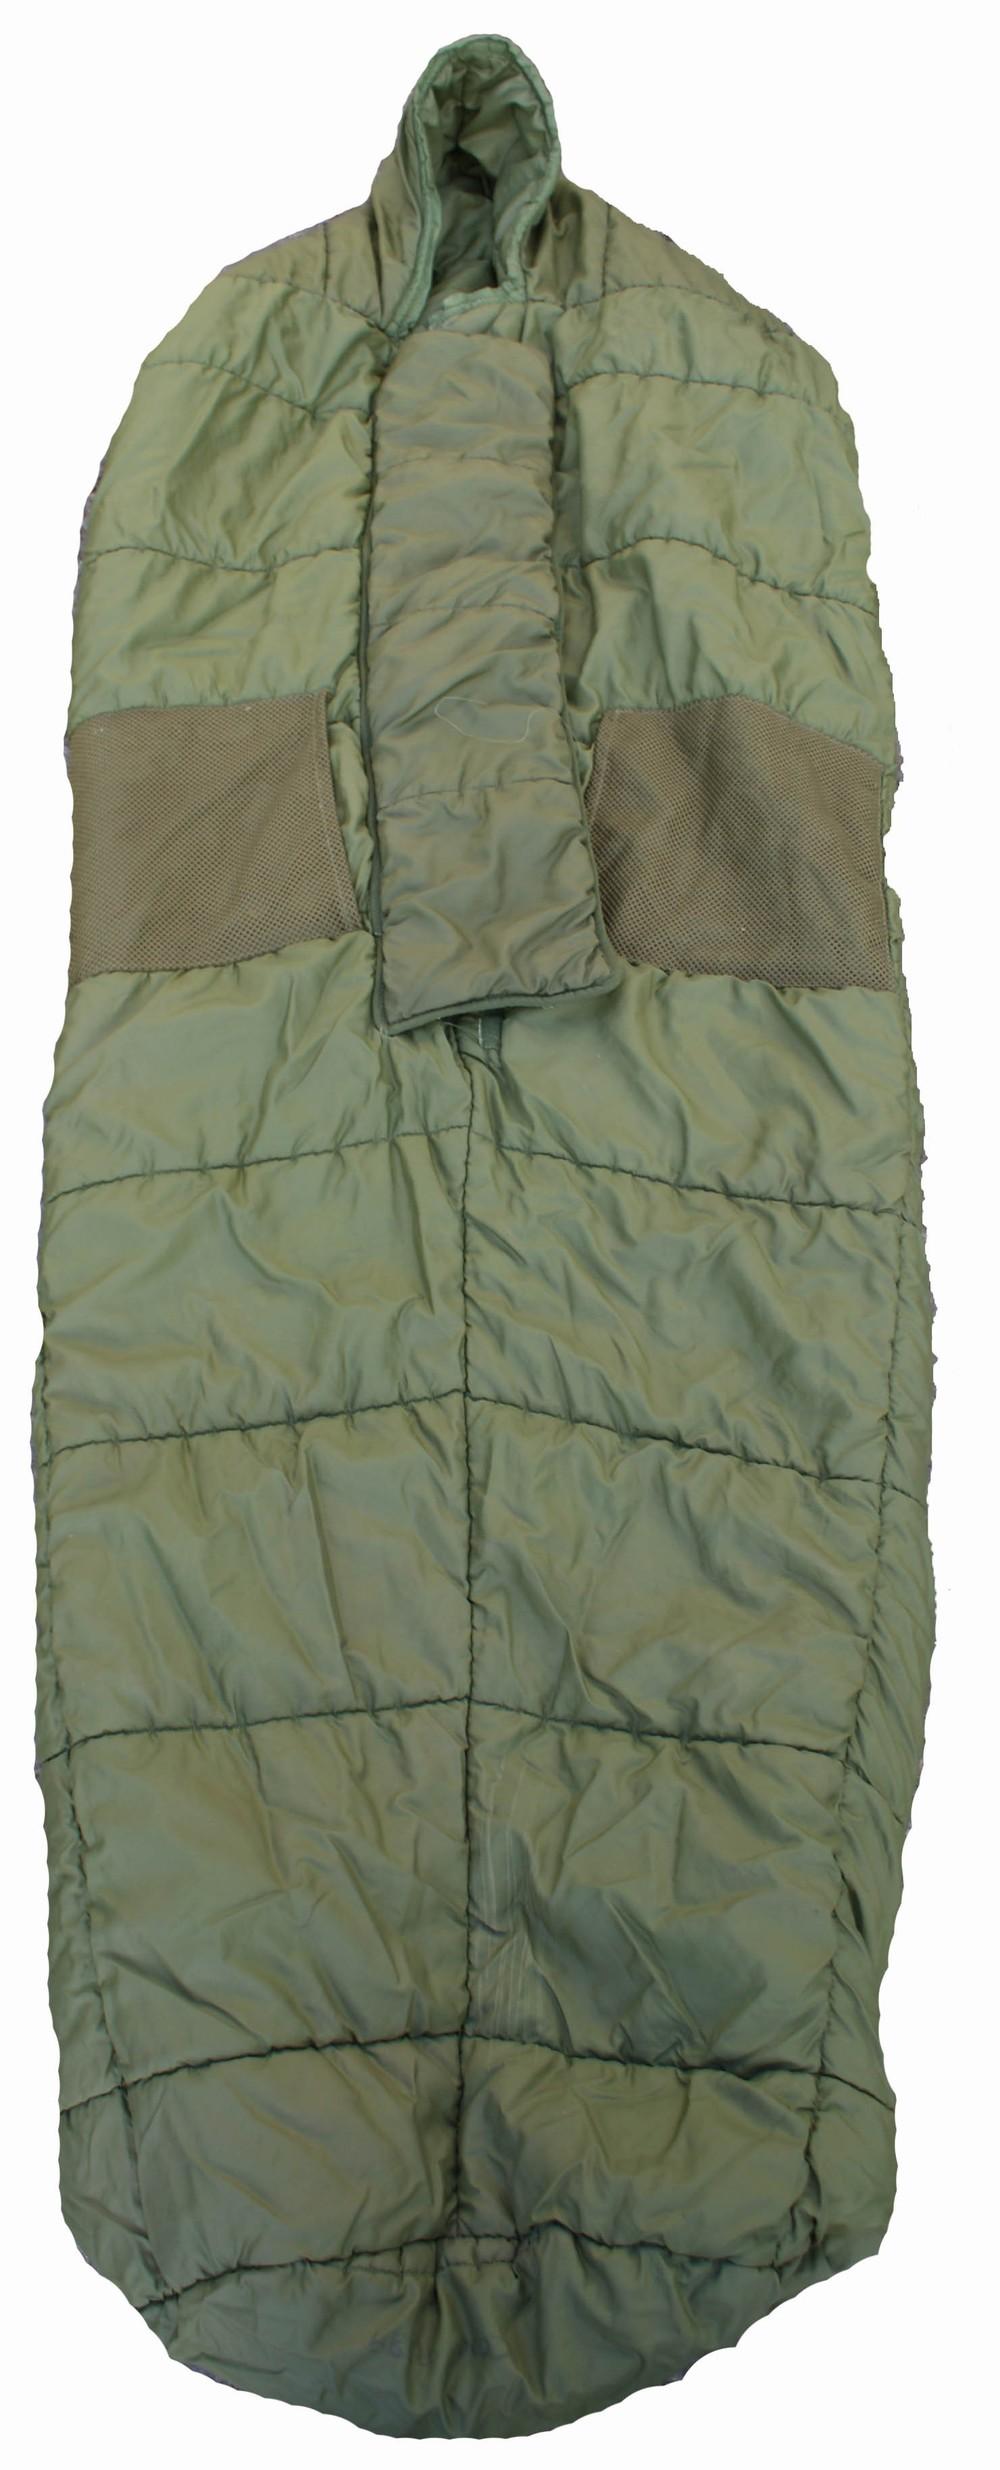 British Army Cold Weather 90 Pattern Sleeping Bag